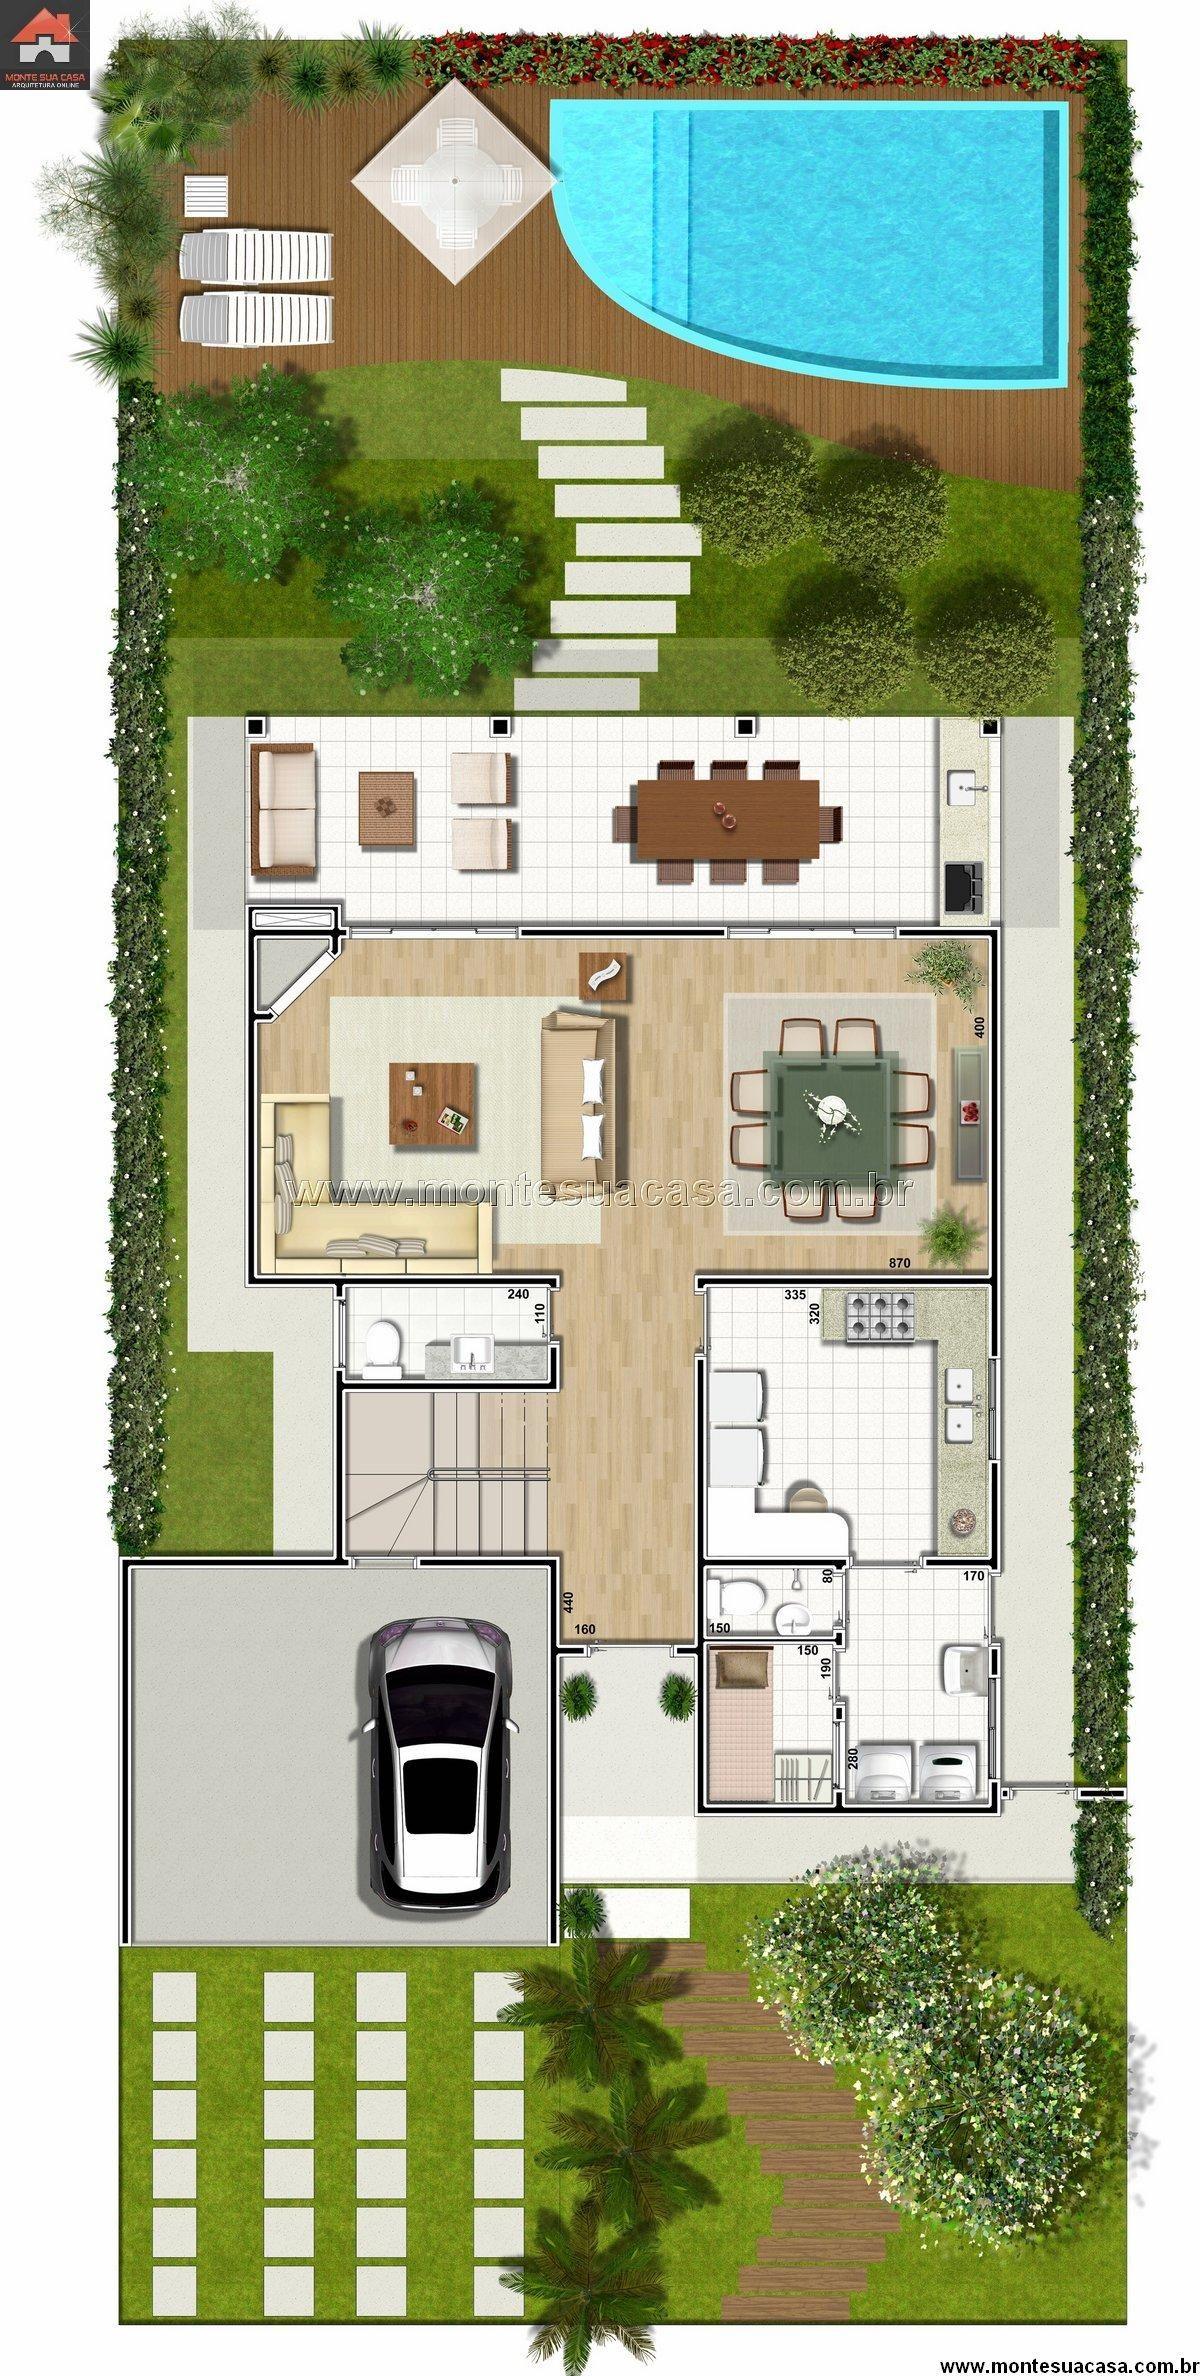 Sobrado 2 quartos projetos pinterest for Casa de campo pequena con piscina